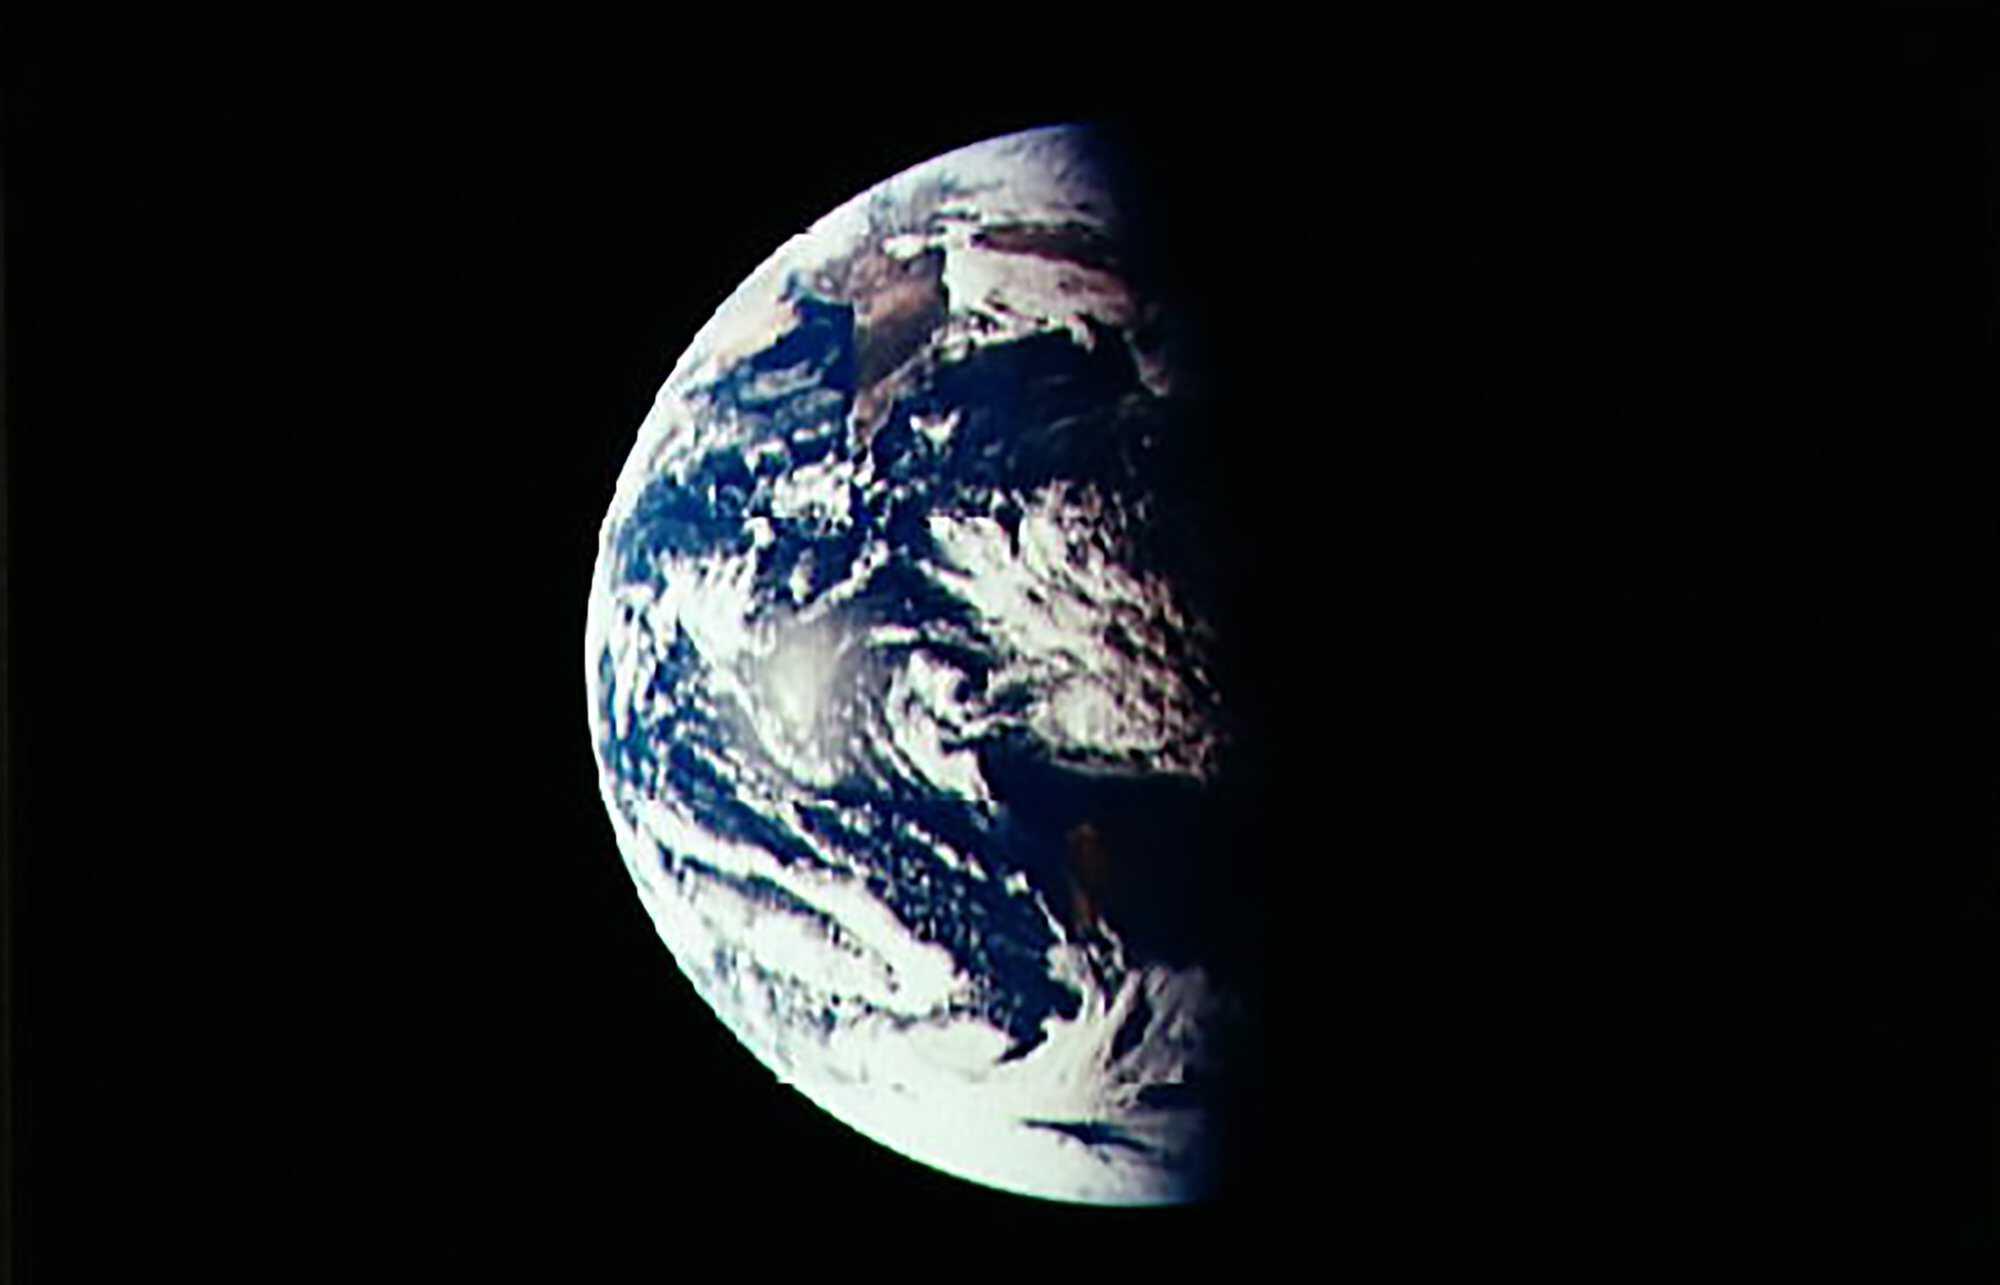 Moon_telecast_earthrise_02.jpg